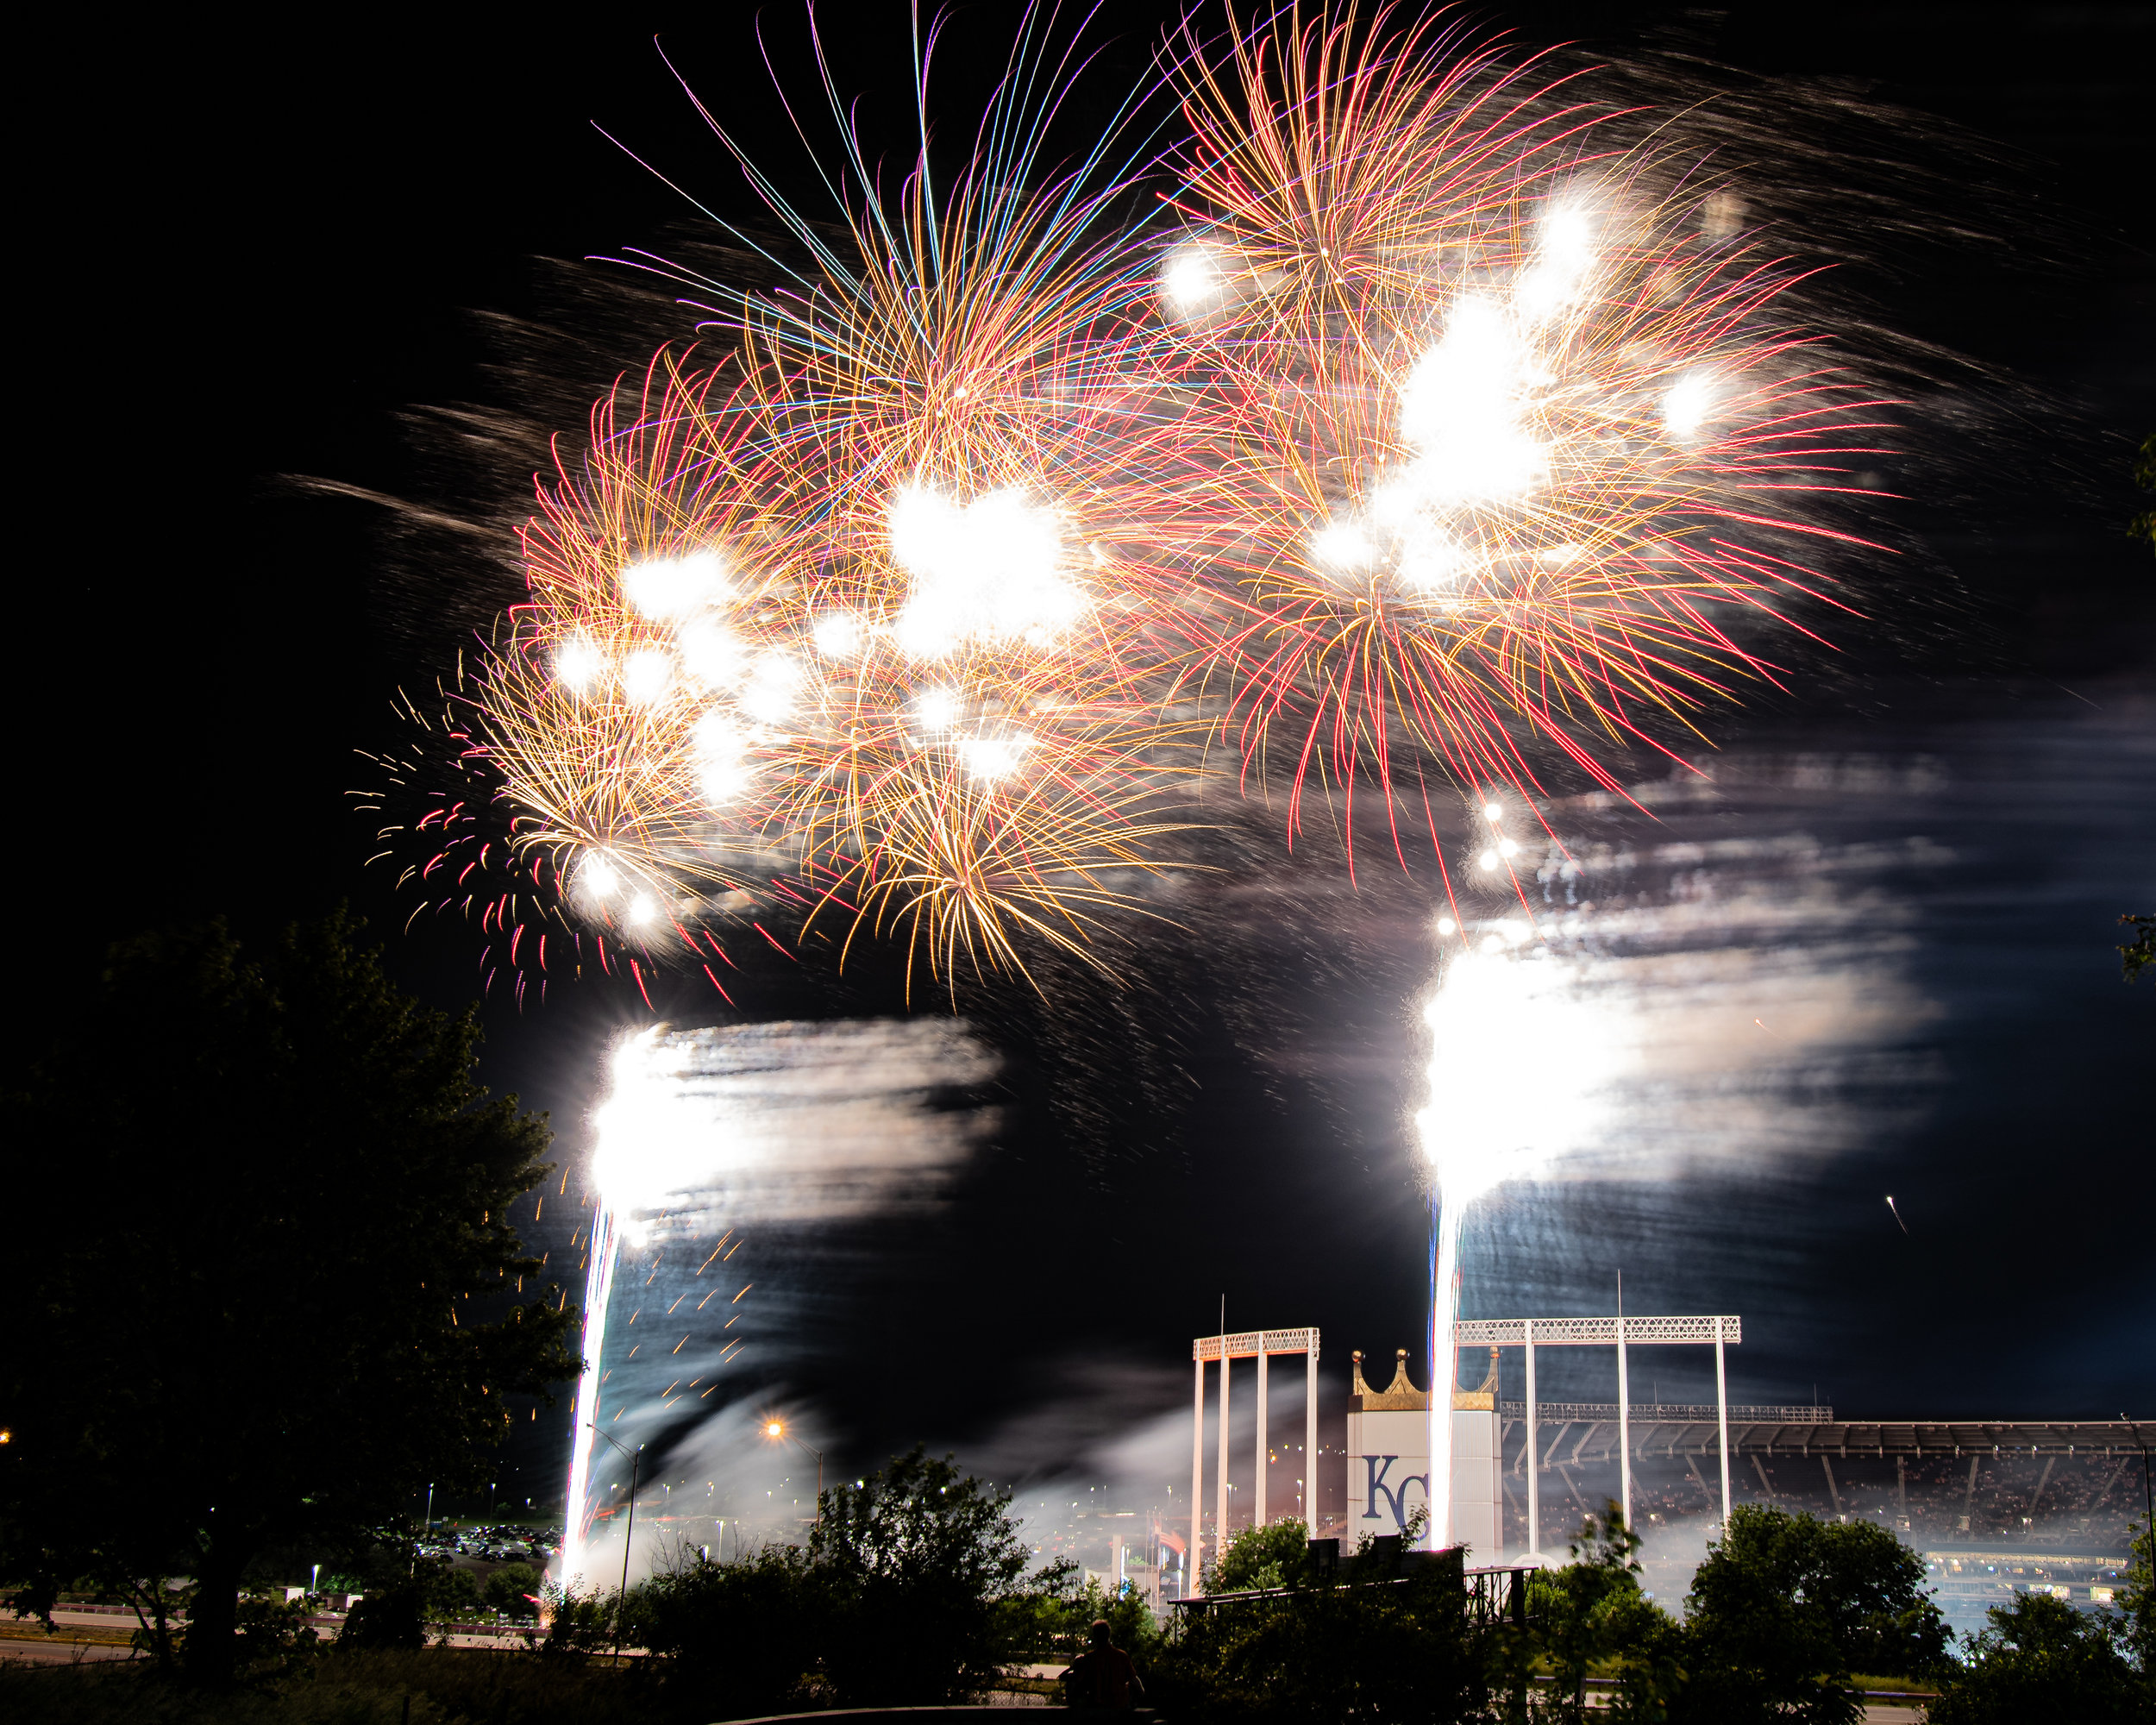 Kansas City Royals Firework Friday (19 of 19).jpg